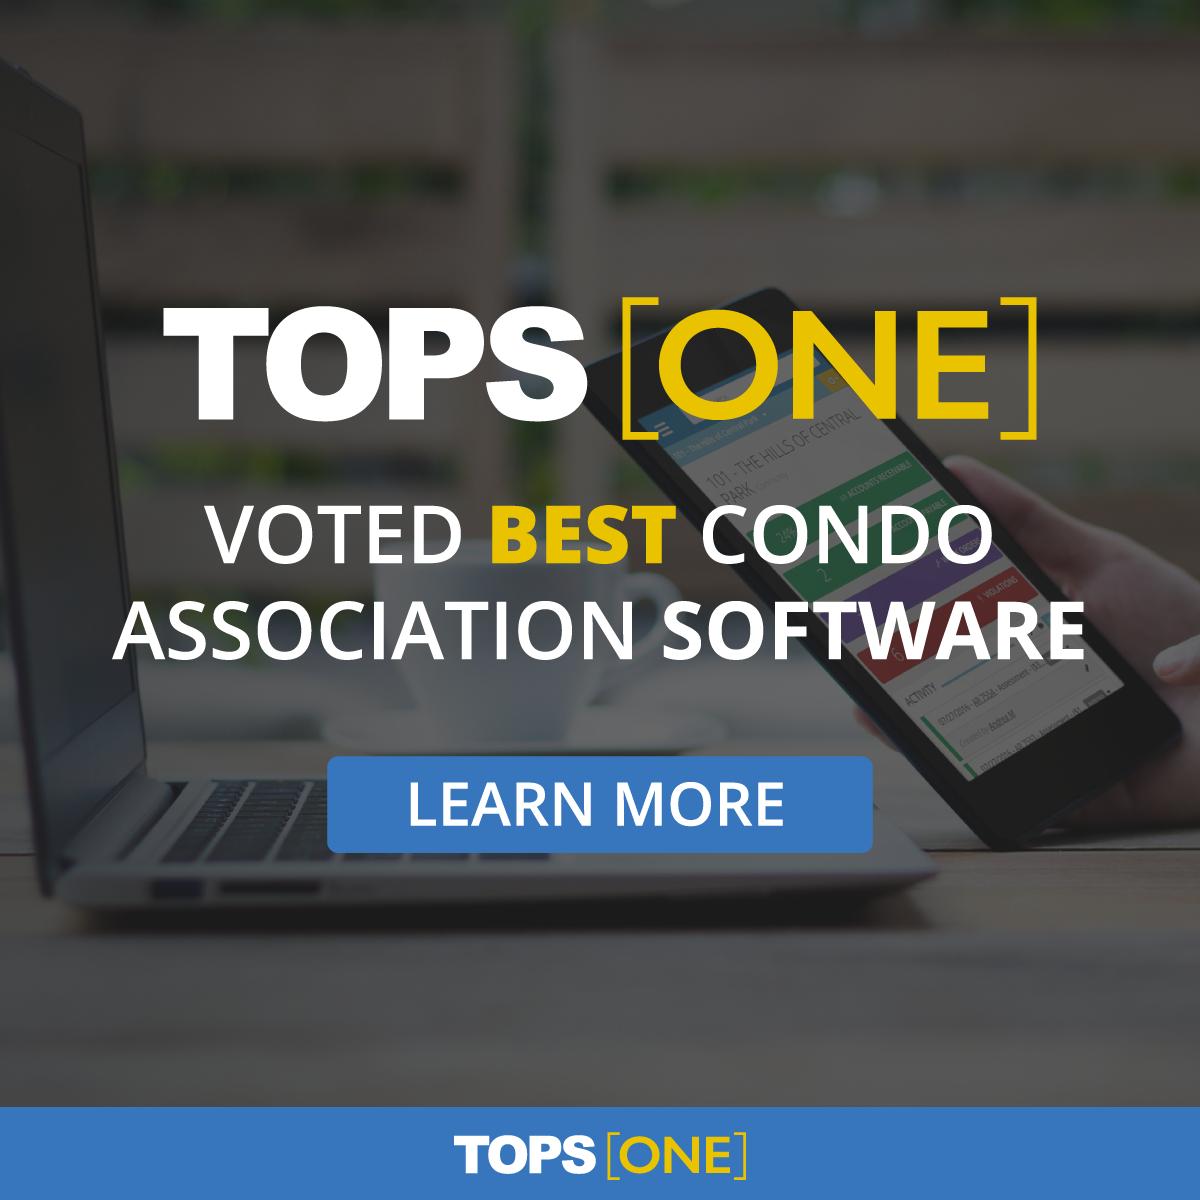 Best Condo Association Software